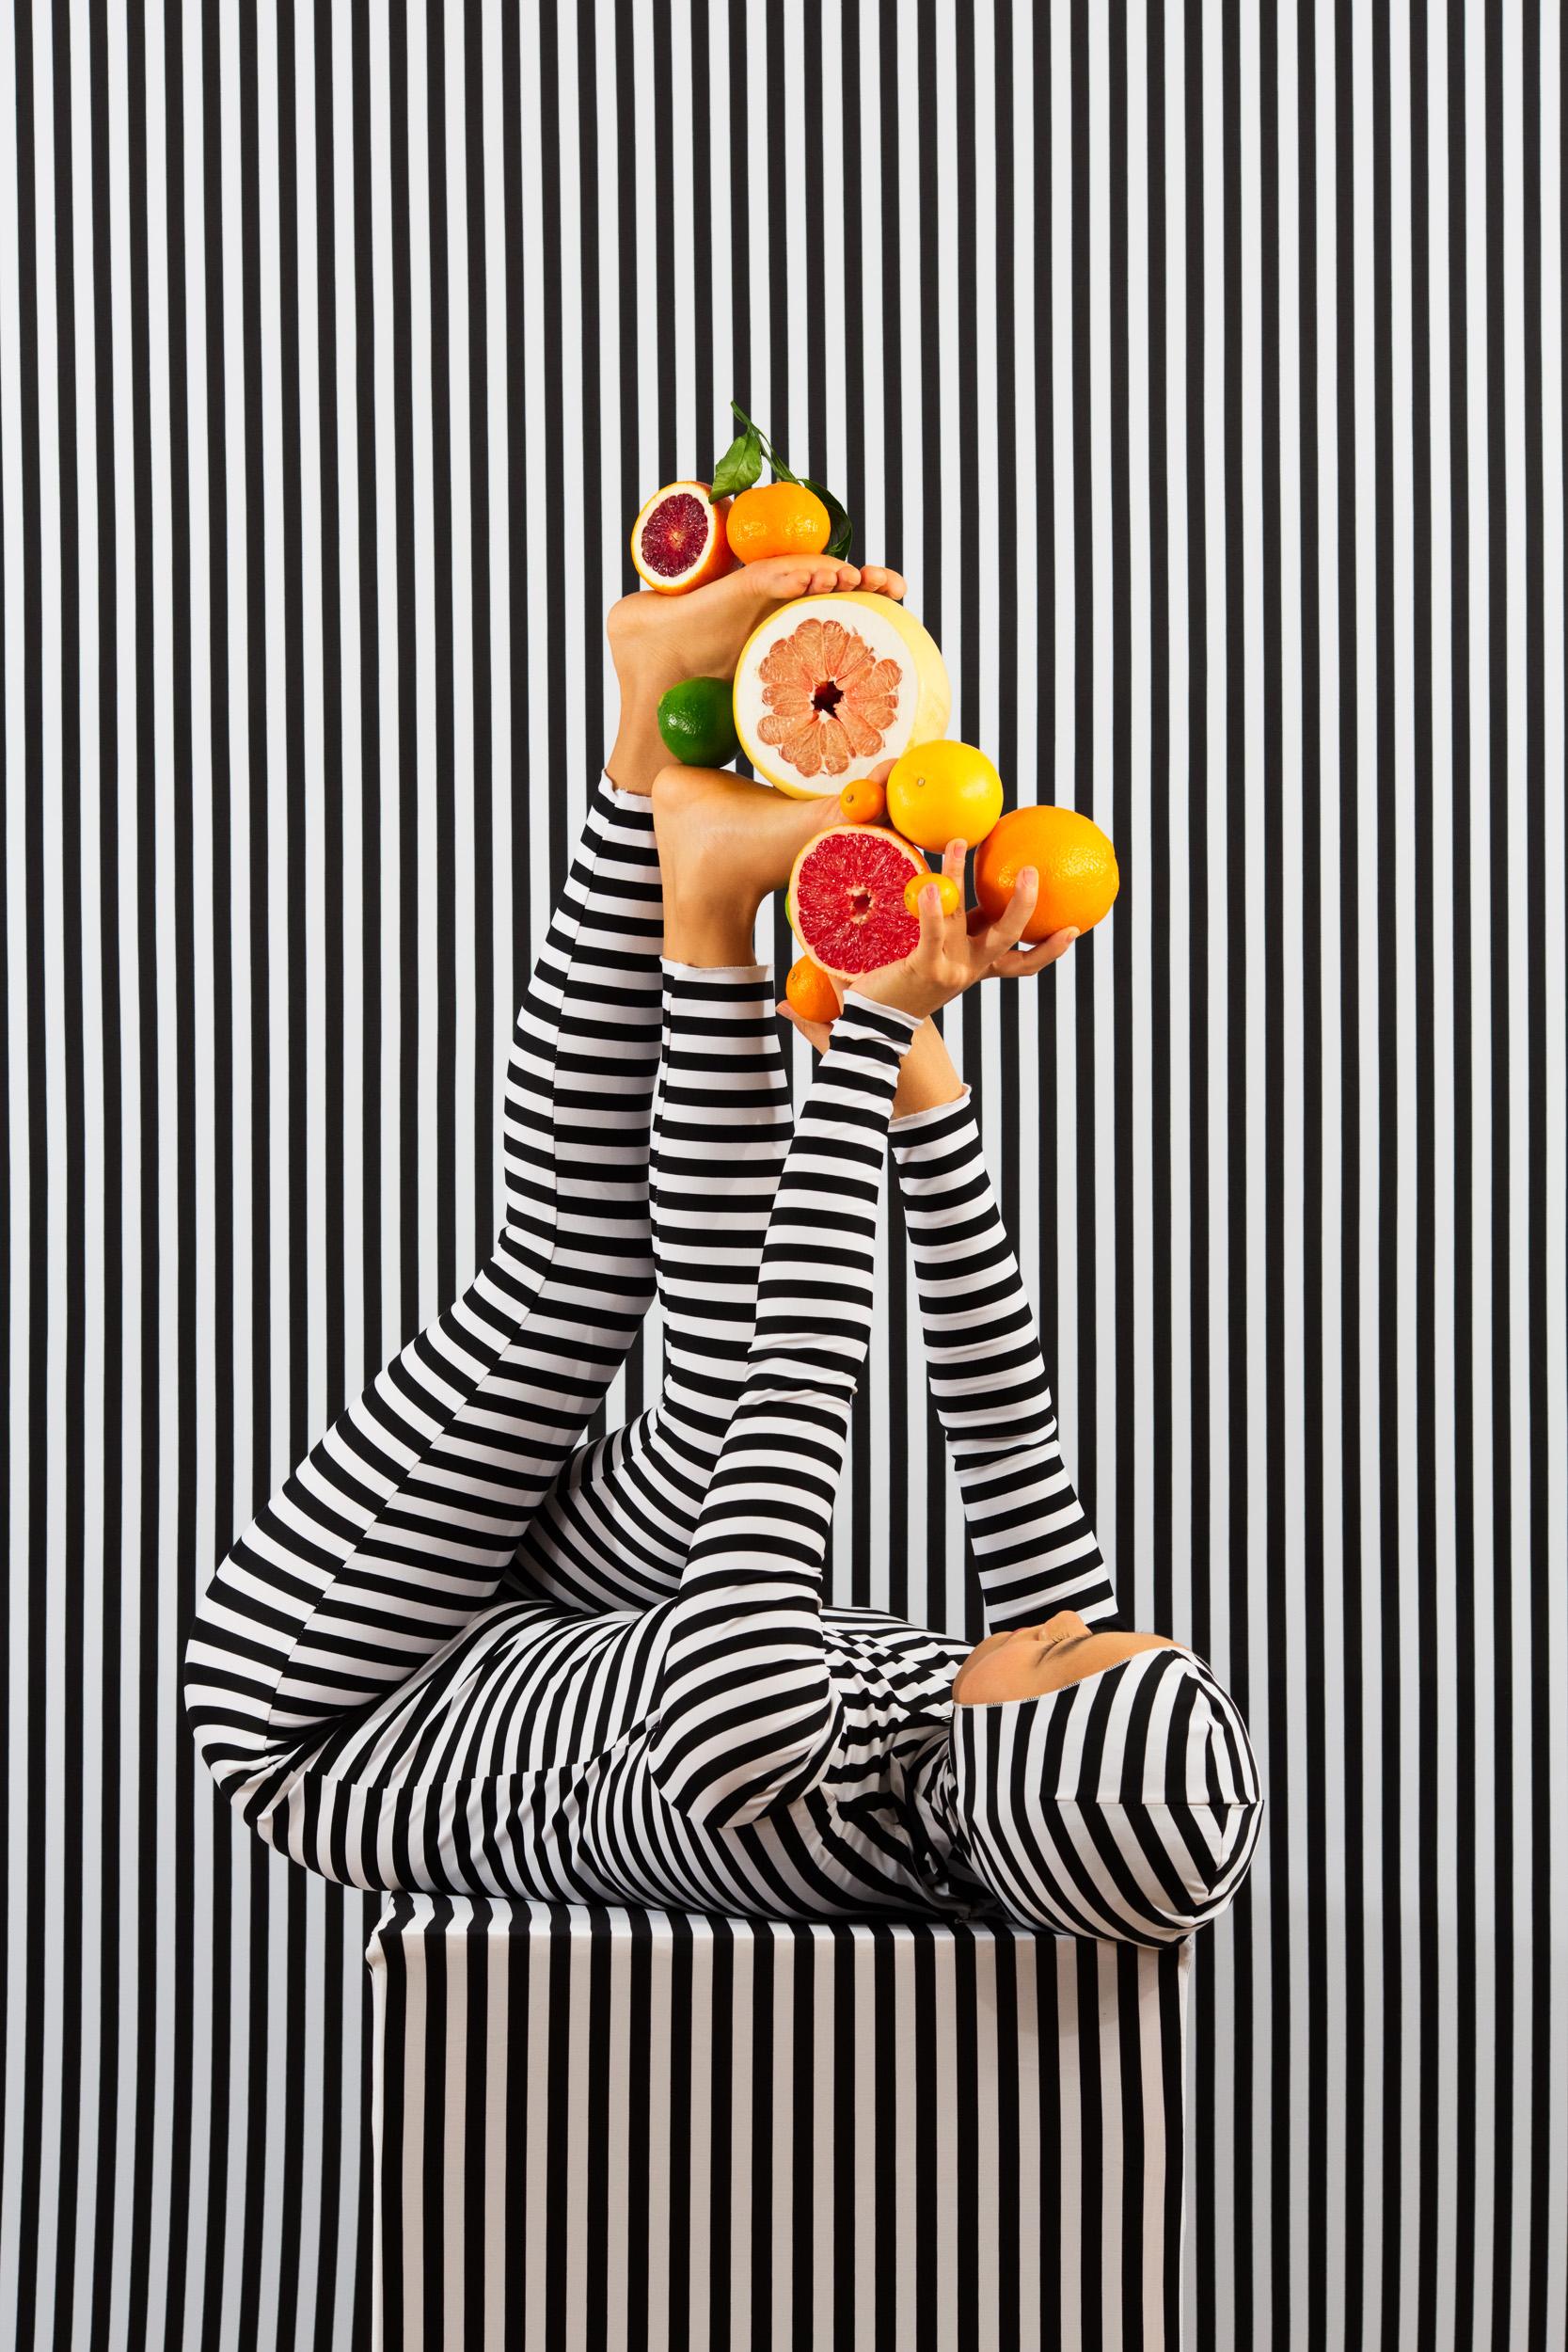 An Arrangement (Stripes Case Study 6)   2018, archival pigment print 91.5 x 61 cm / 36 x 24 in. Edition of 3